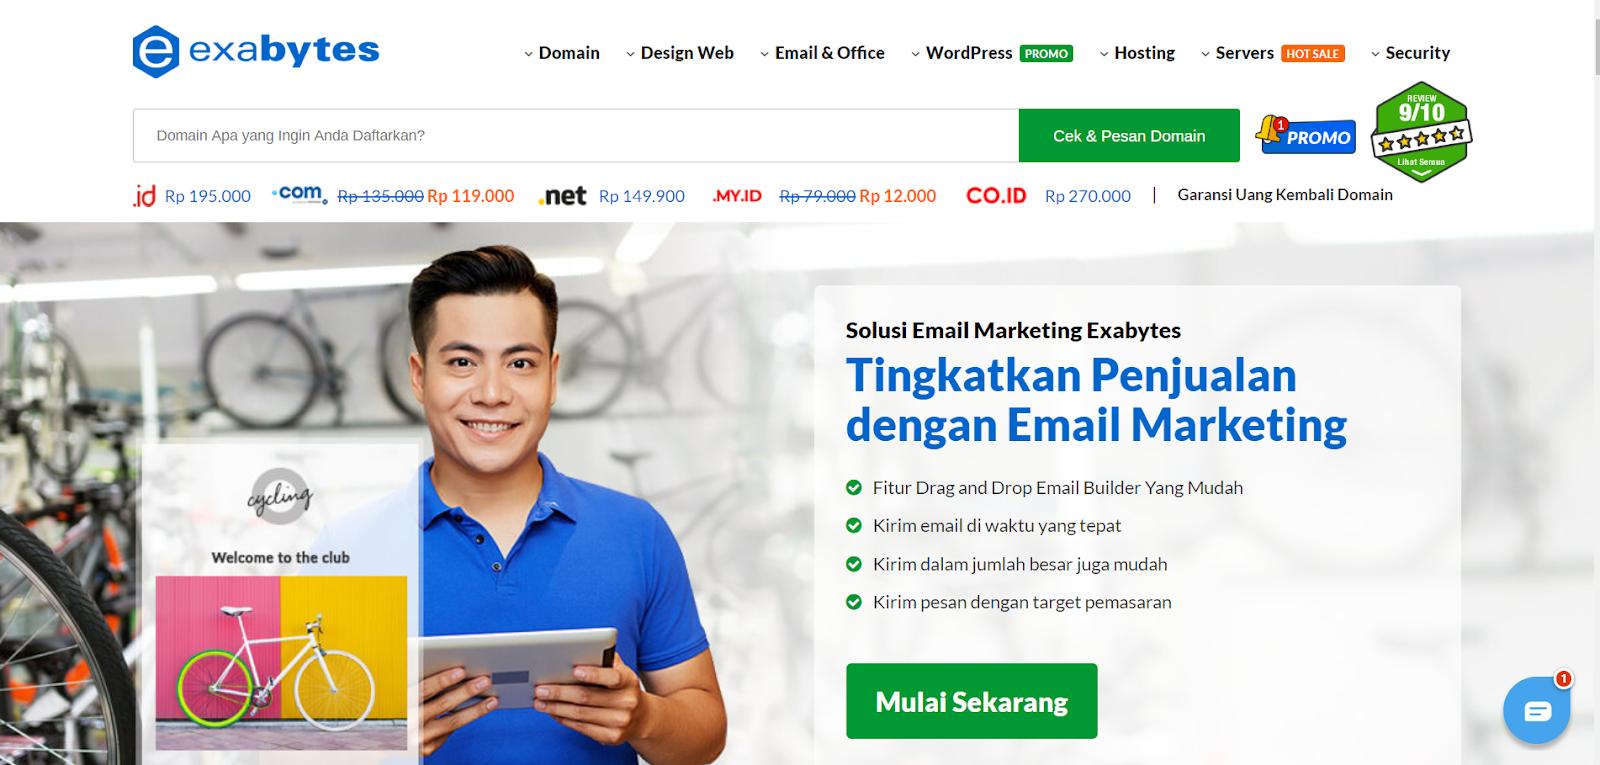 Memperkenalkan EBuzzzz Email Marketing Terbaru & Terbaik dari Exabytes - 2021